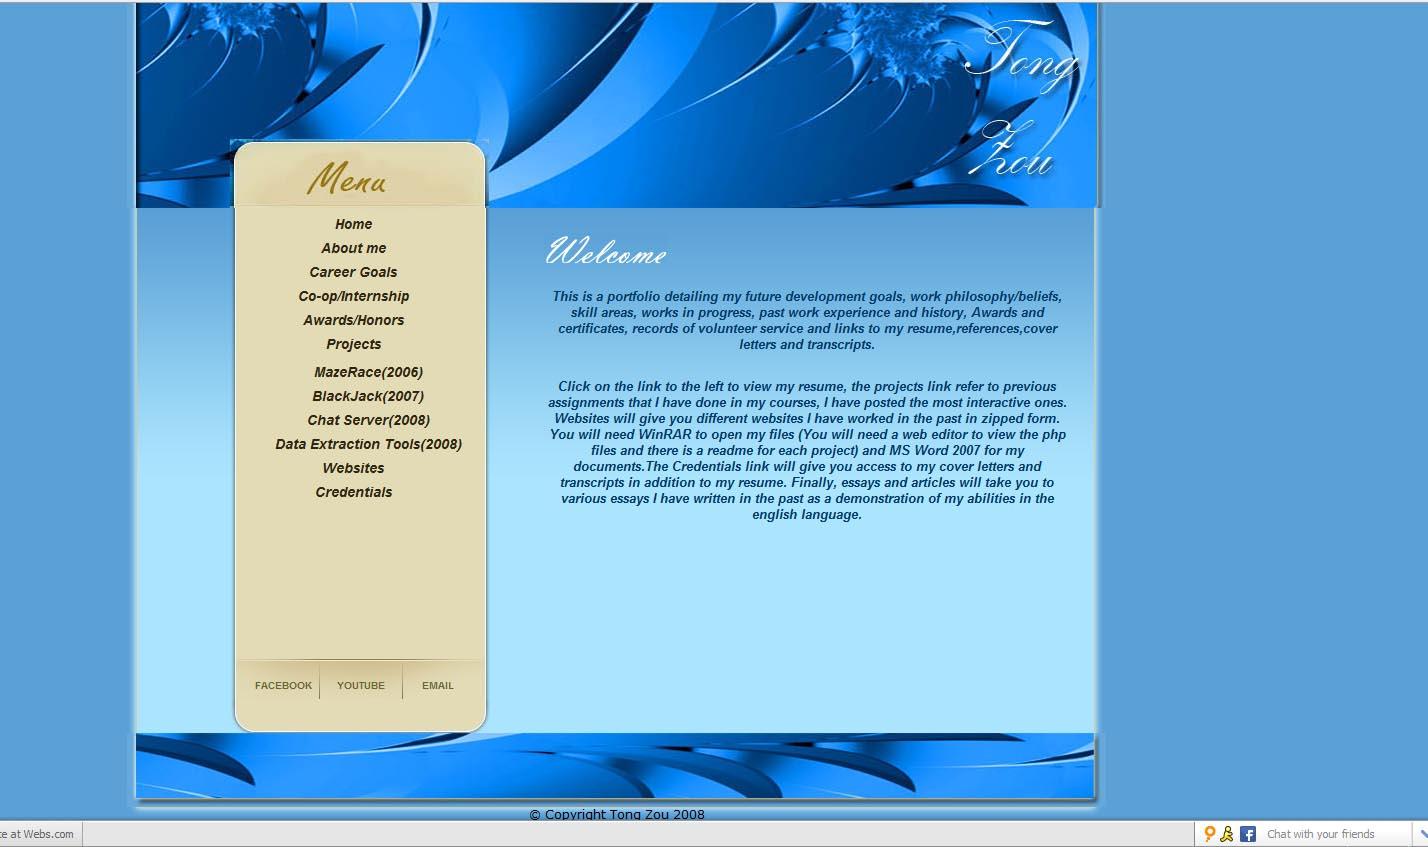 Previous portfolio site (2008-2009)